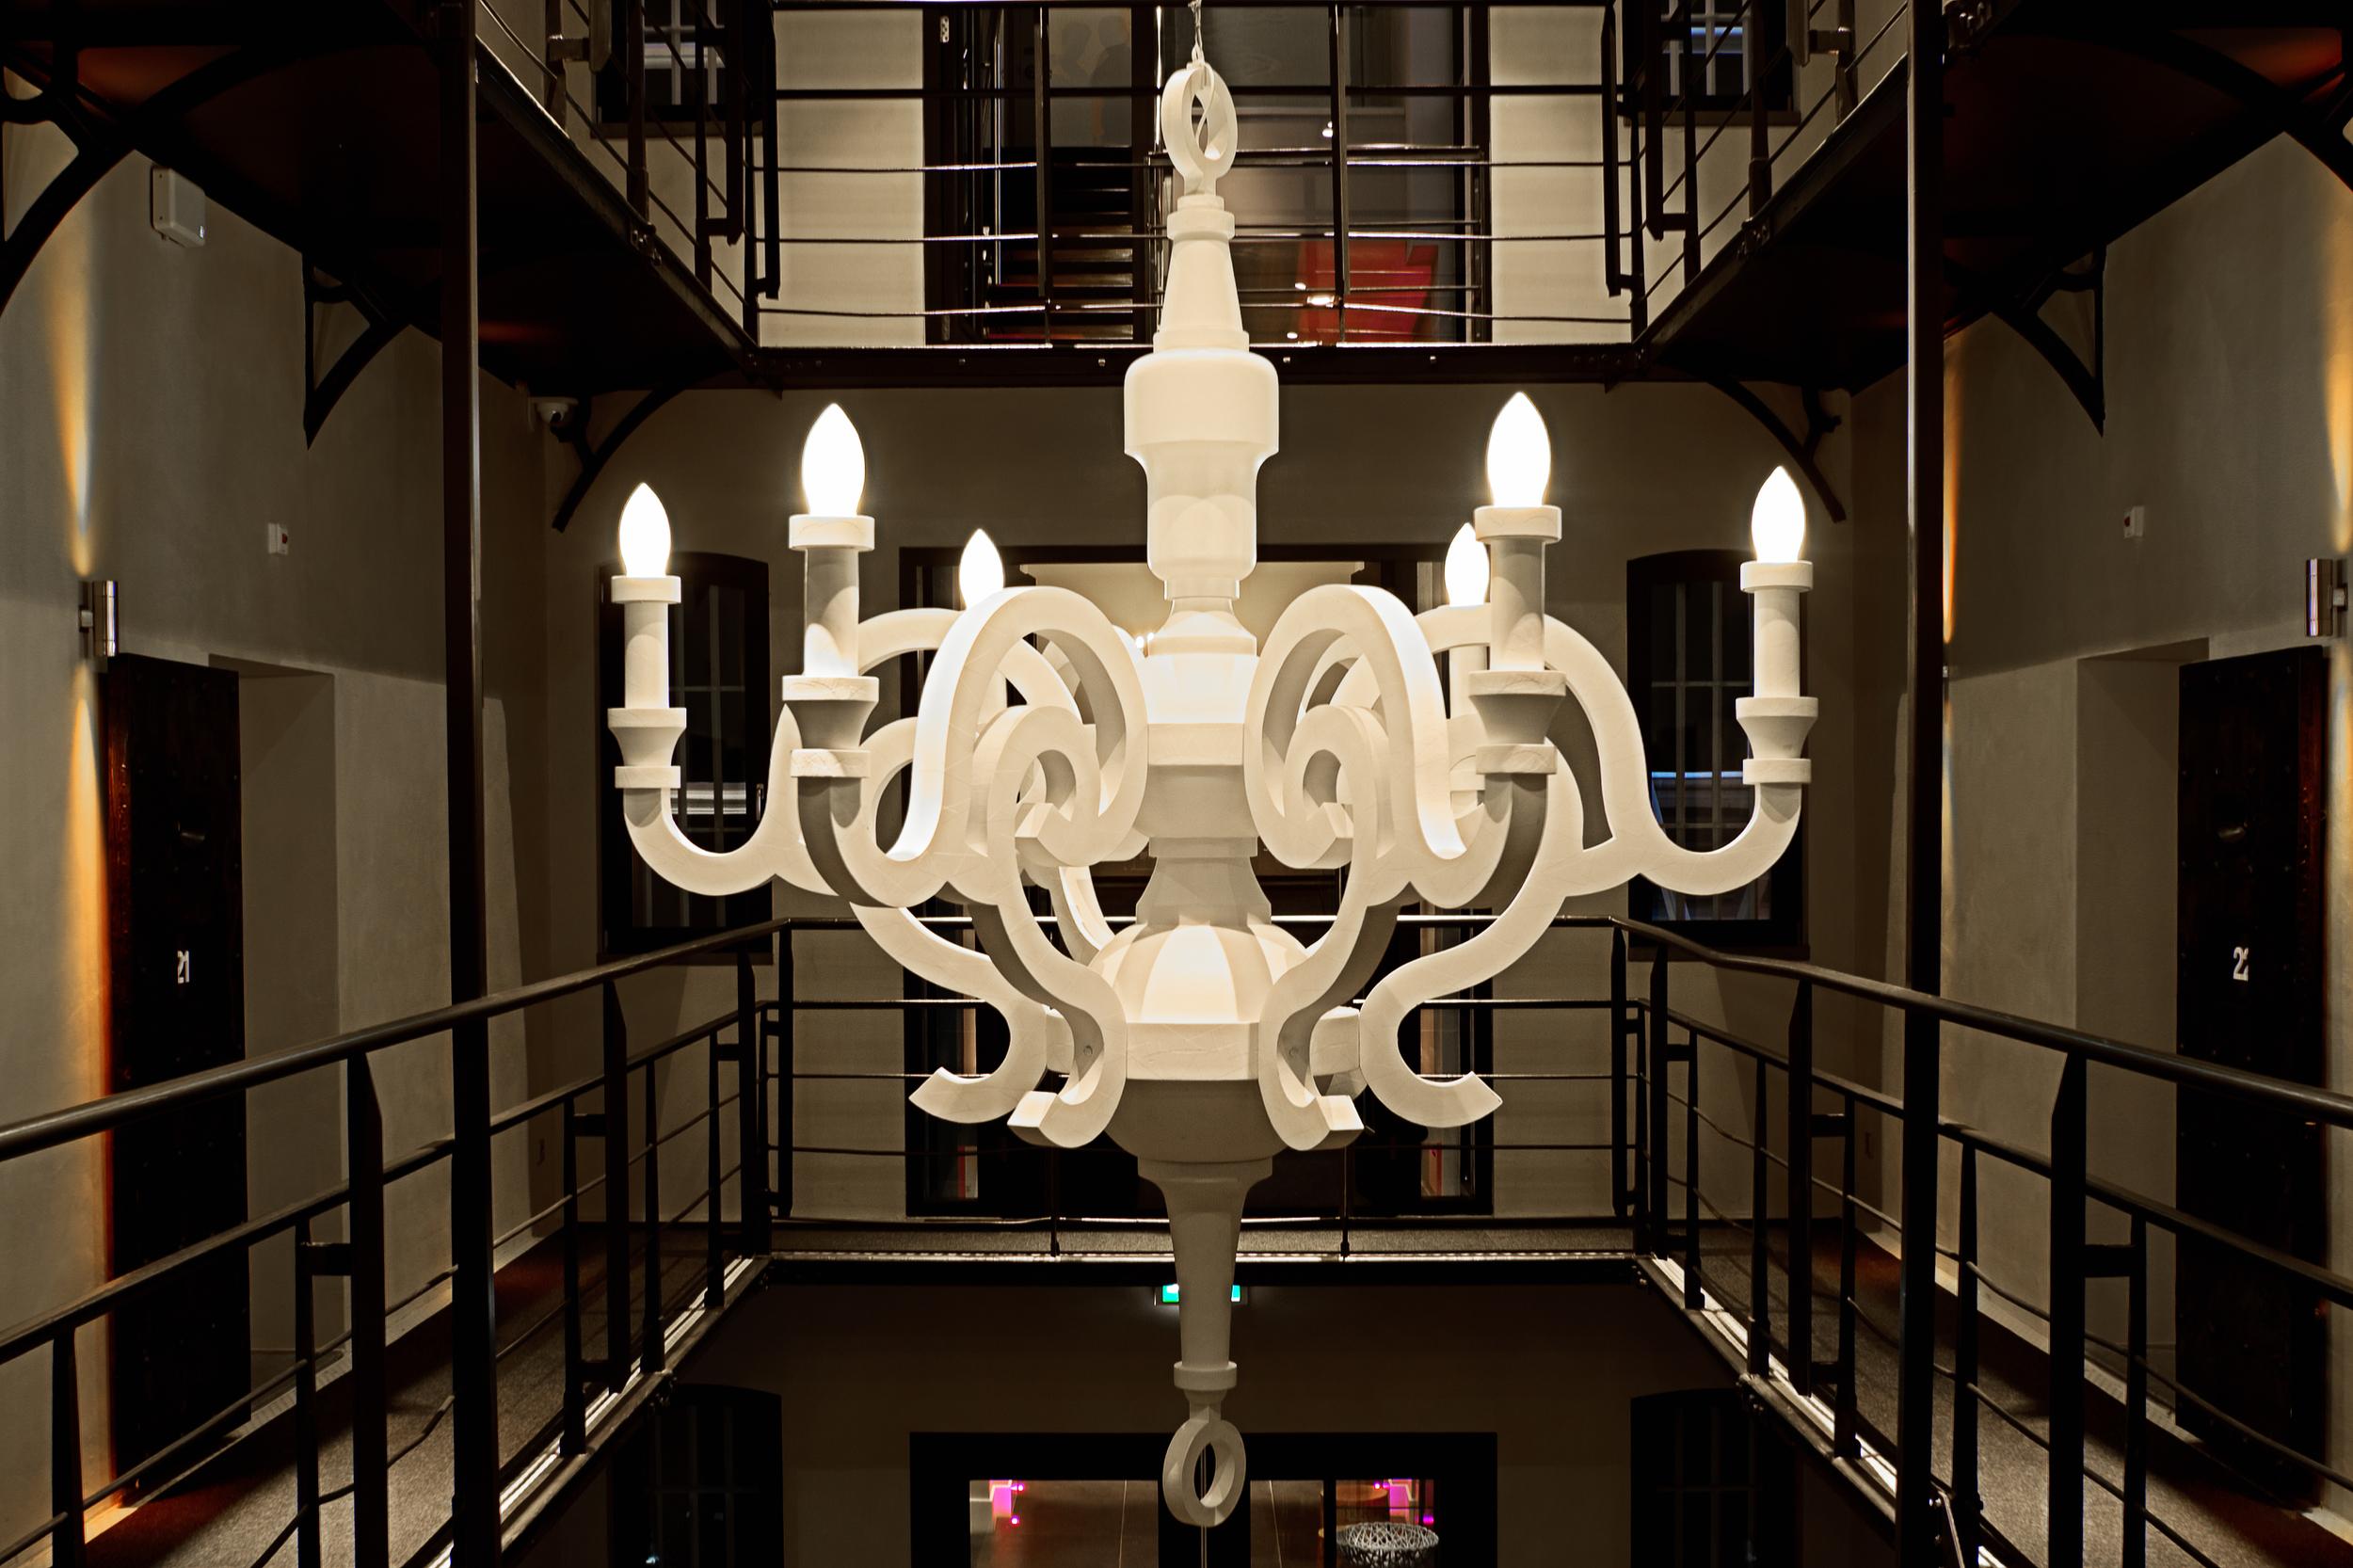 Archi.int_Het_Arresthuis_20110710_HDR13.jpg